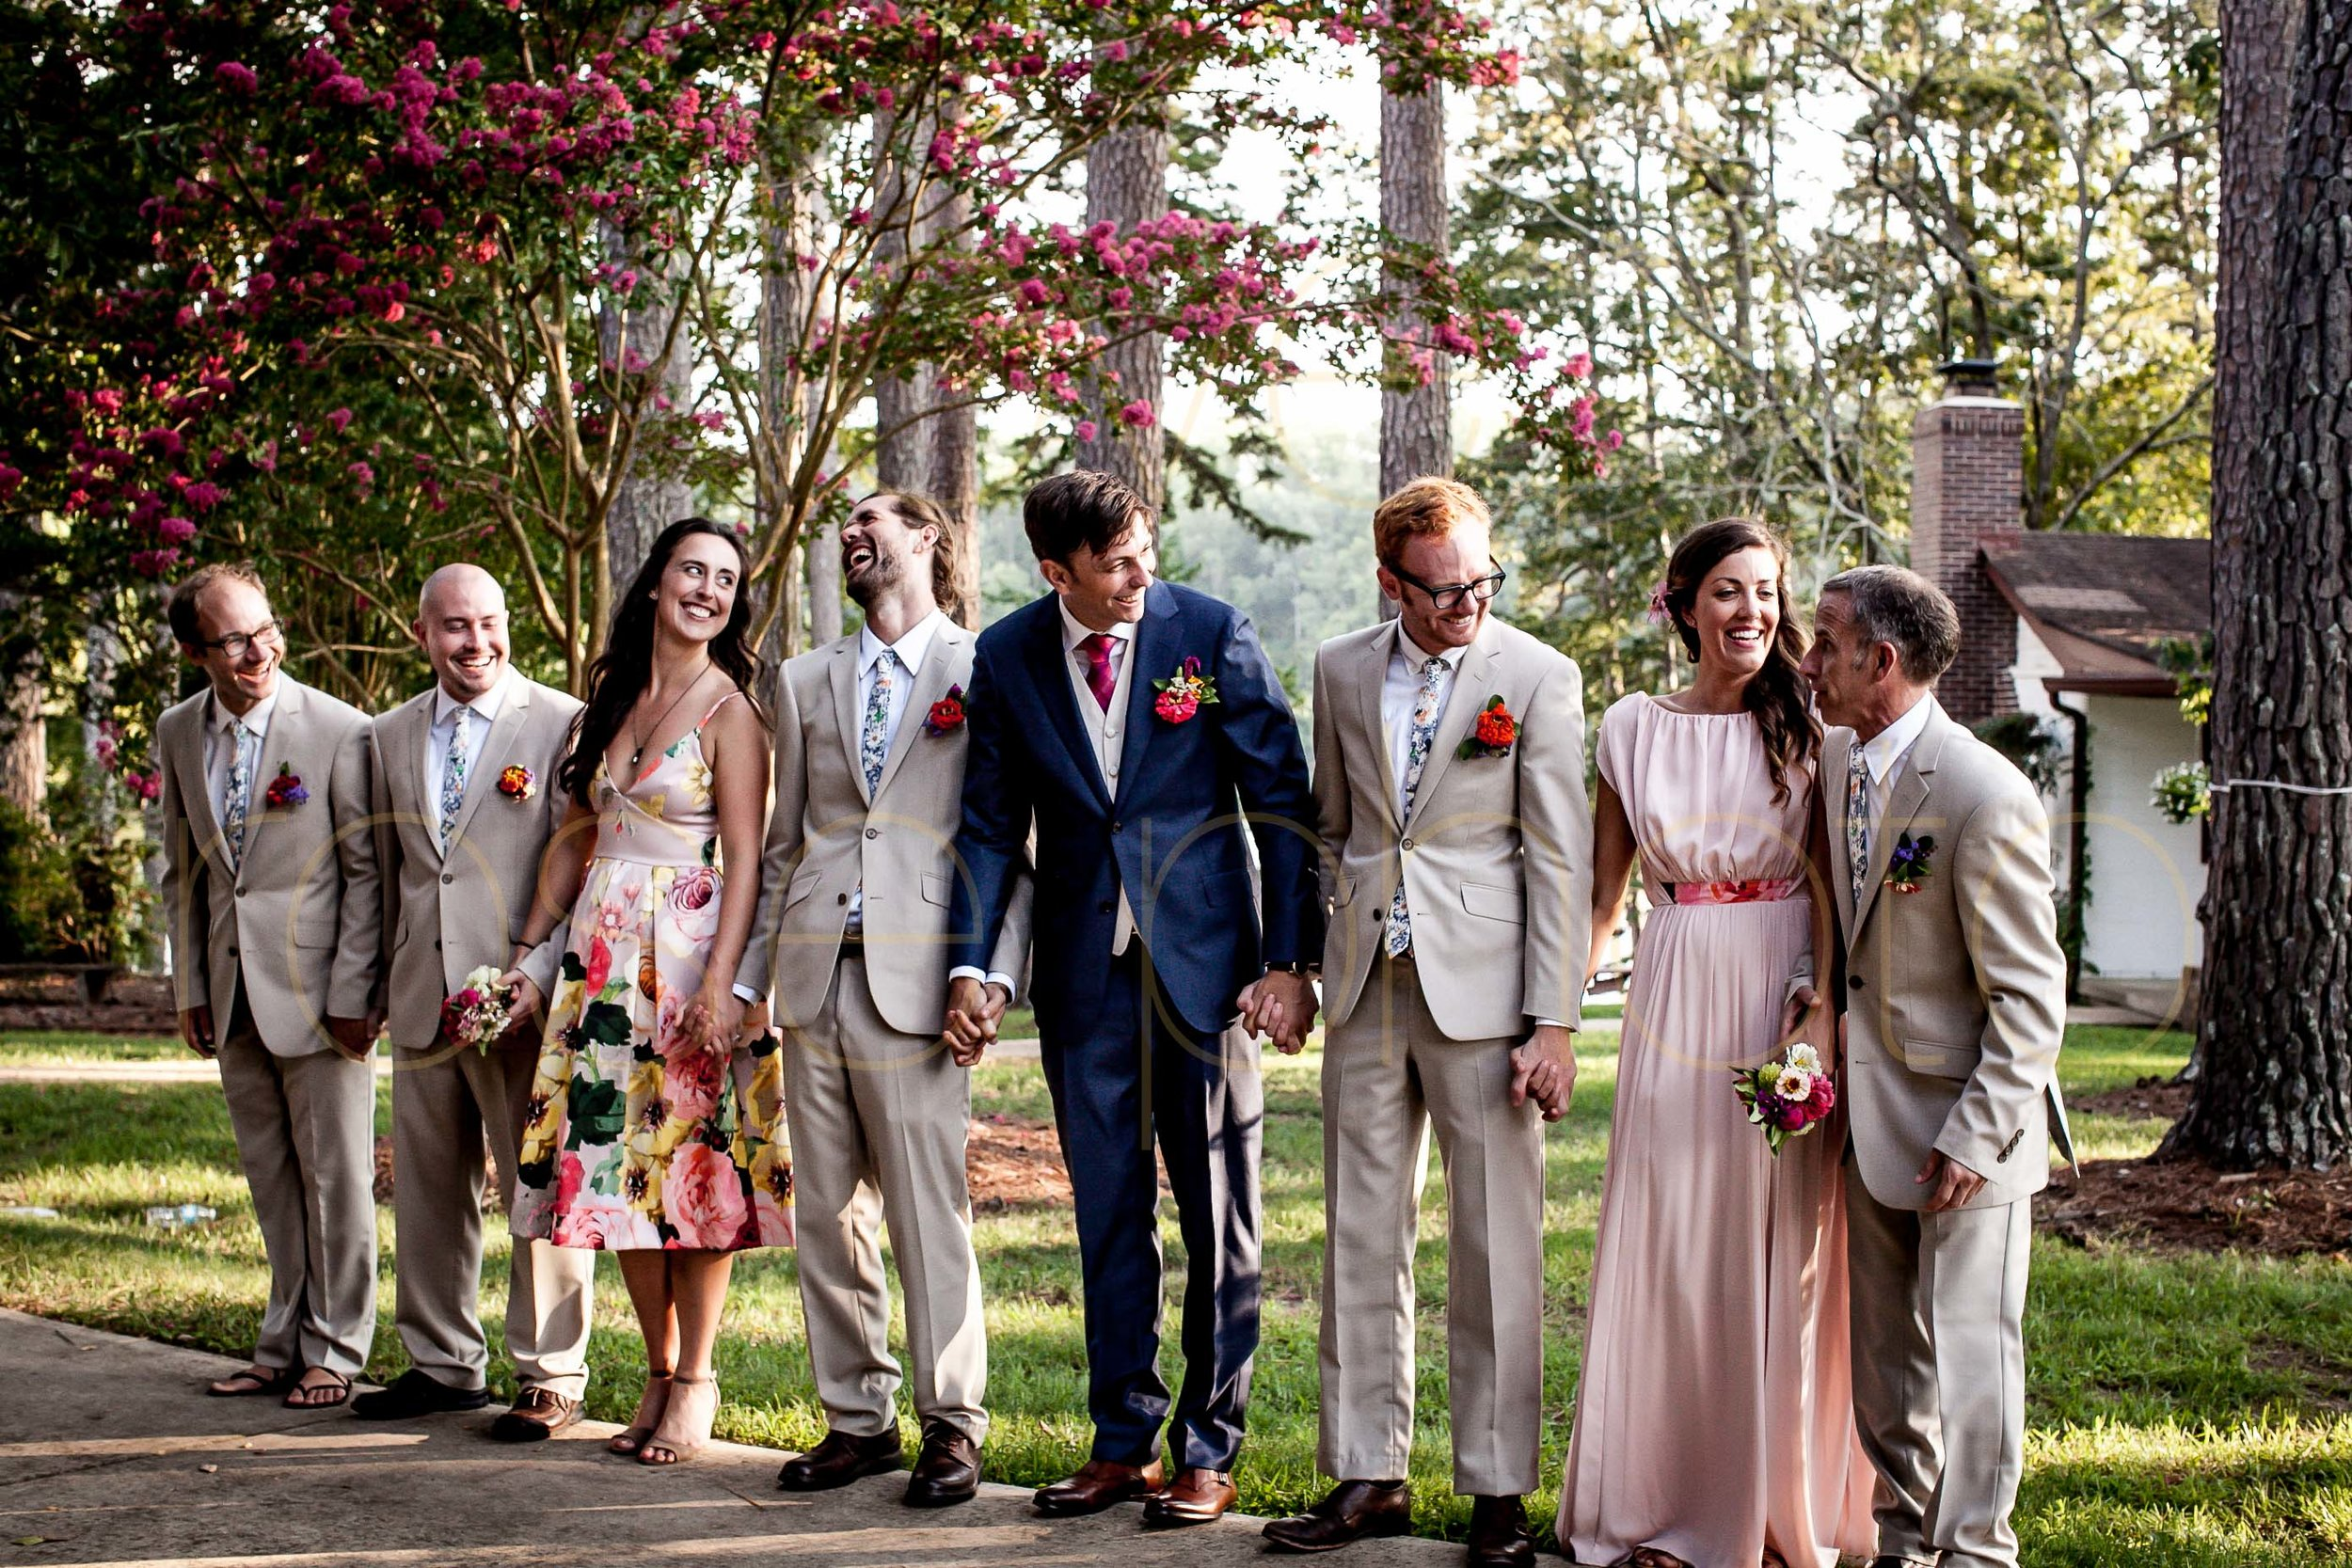 Rose Photo Asheville Wedding Photographer Nasheville Weddings Charleston Bride Chicago photojournalist weddings -47.jpg